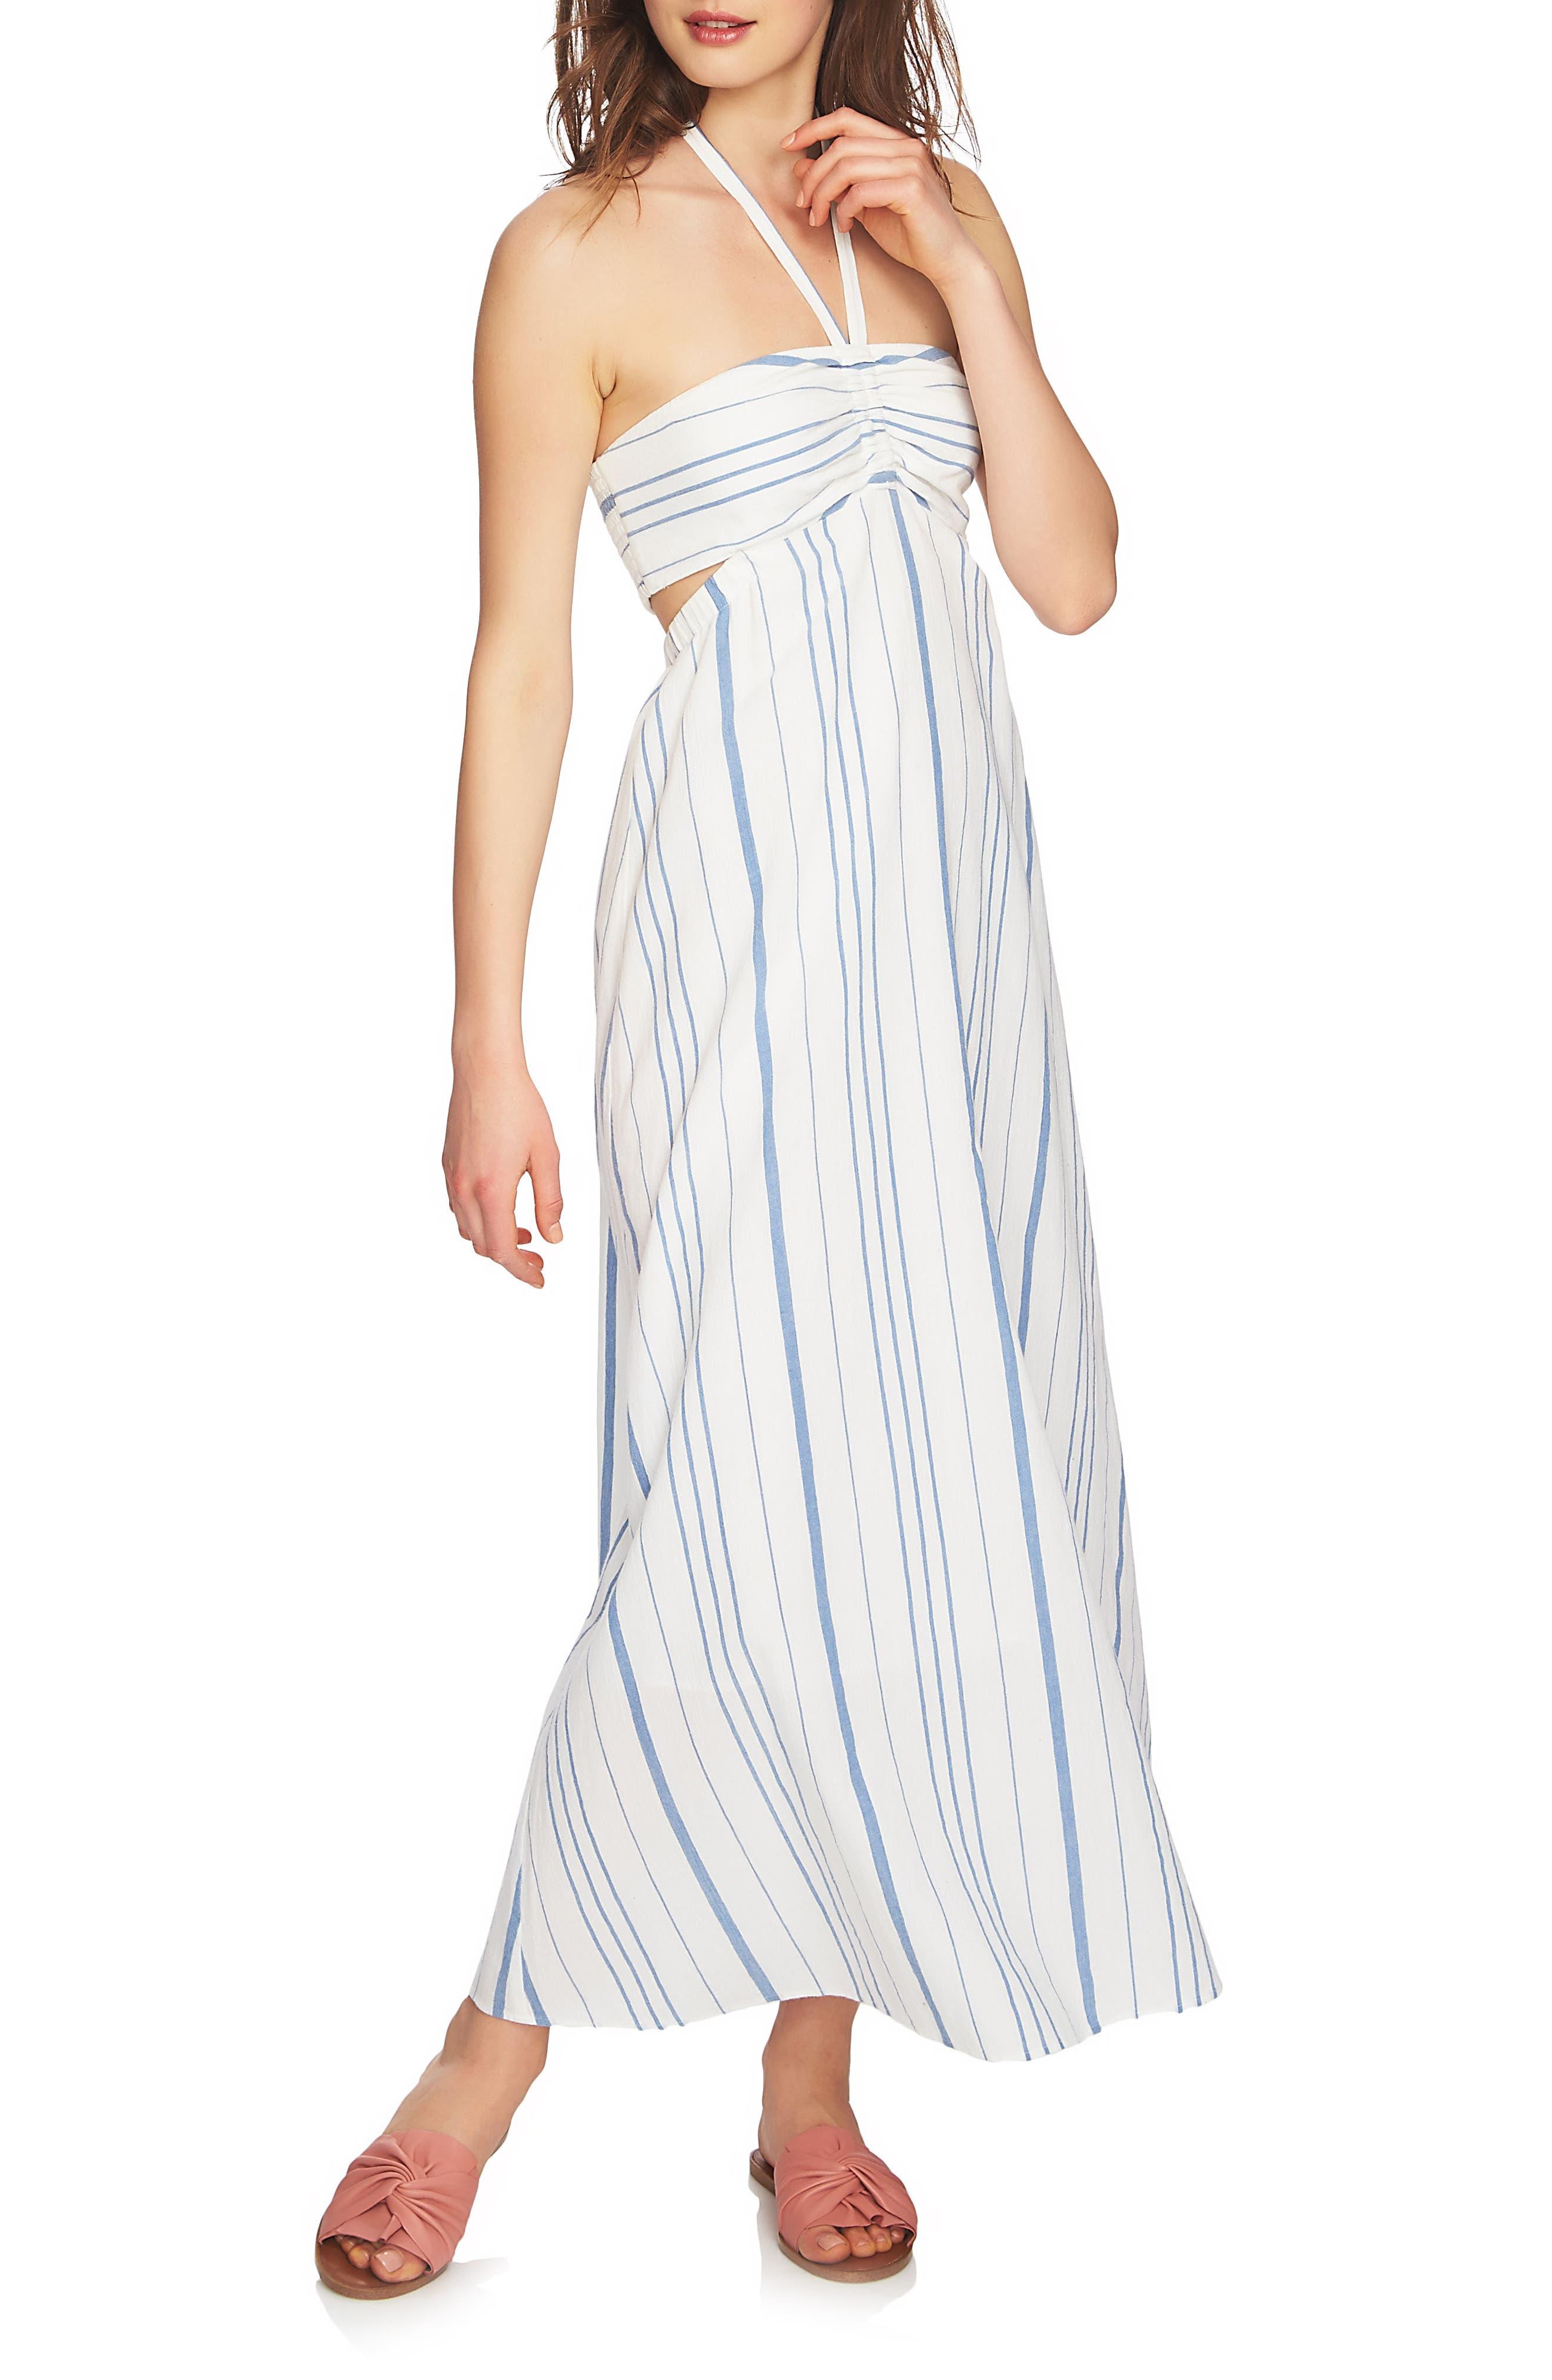 Cinched Bodice Maxi Dress,                         Main,                         color, Antique White